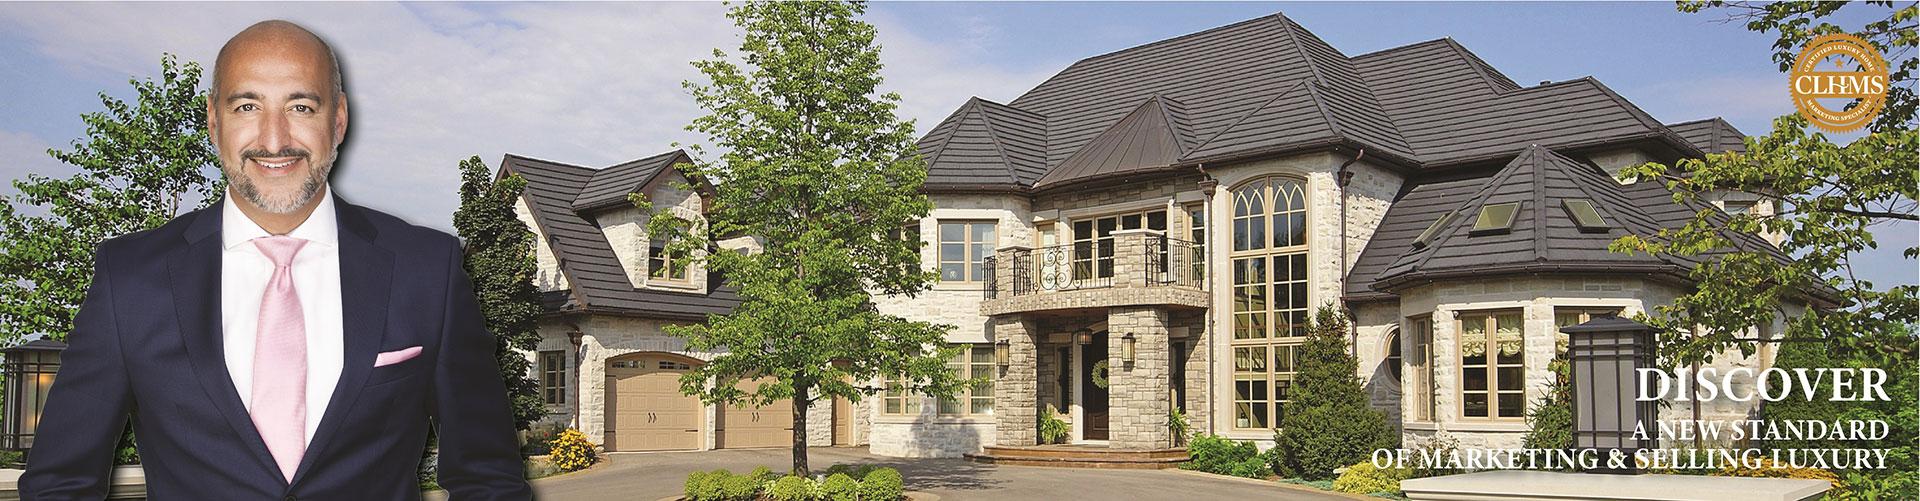 Top Luxury CLHMS - SRES - CNE - ABR - SRS Real Estate Broker Joseph Azimi In Toronto Vaughan Kleinburg Oakville Mississauga Brampton Milton Caledon Etobicoke Markham Richmond Hill Joseph Azimi, Broker 5